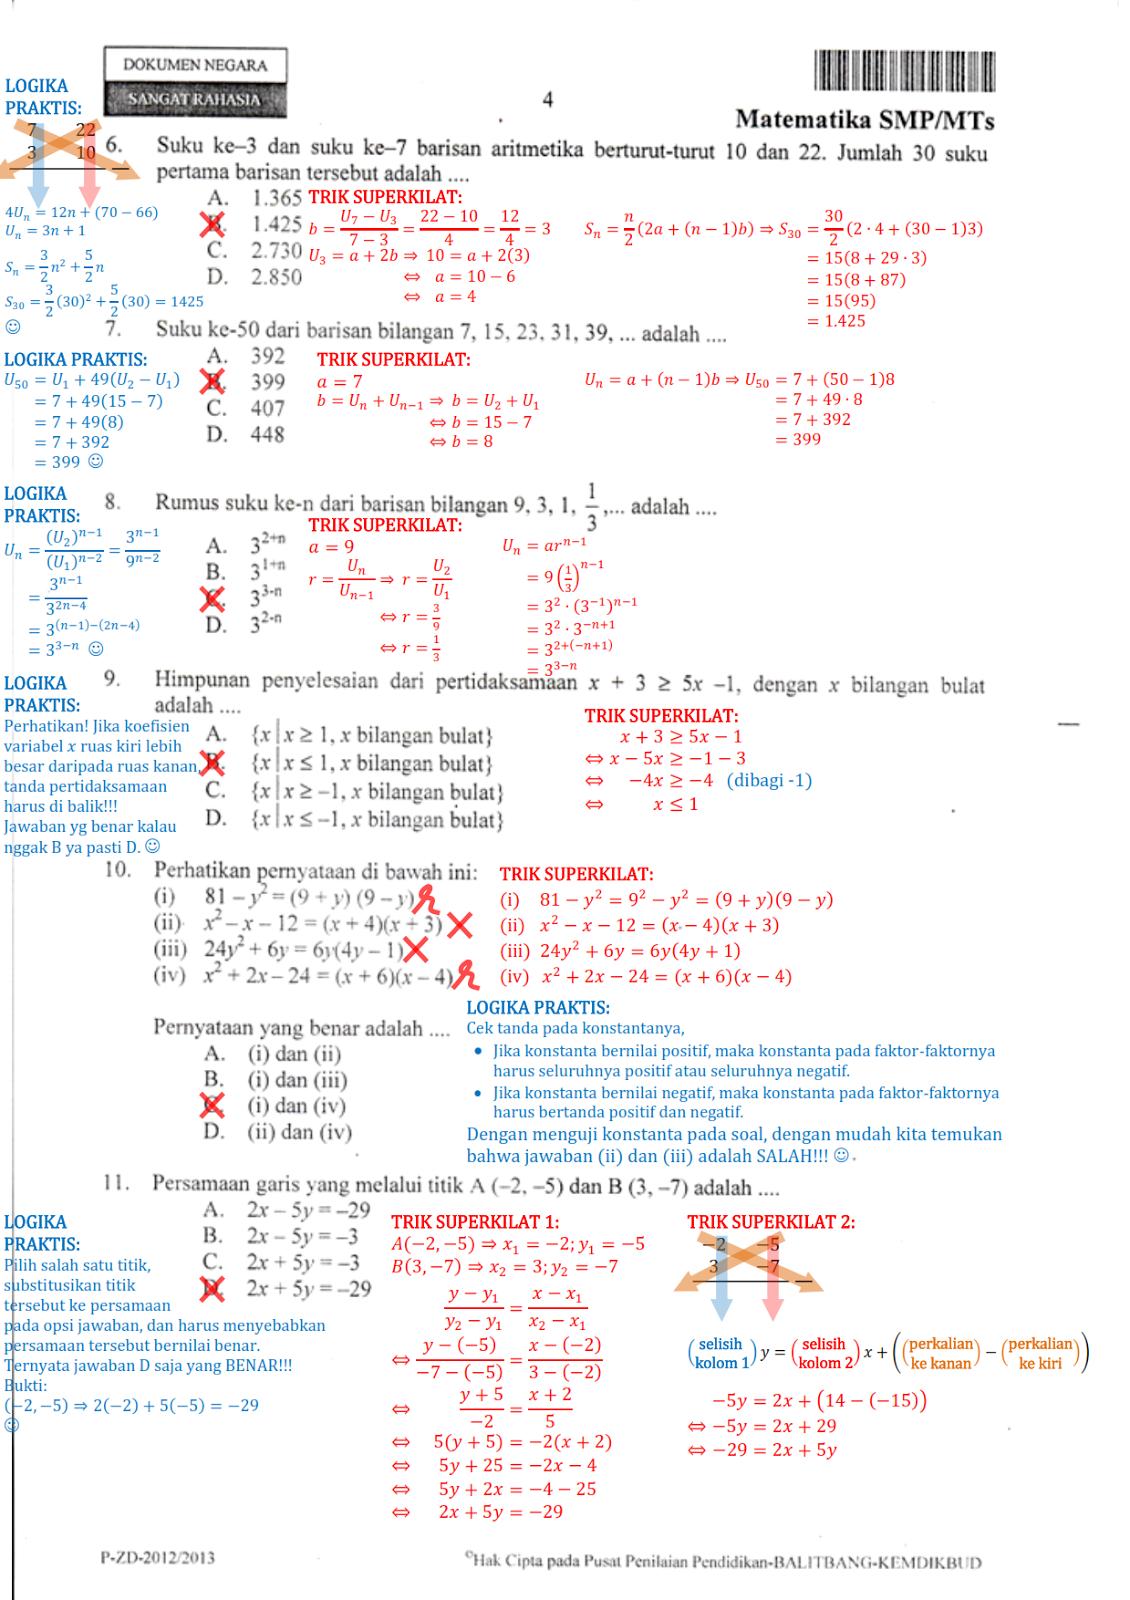 Bank soal un ipa smp - Contoh Pembahasan Soal Un Matematika Smp 2013 Menggunakan Trik Superkilat Dan Logika Praktis